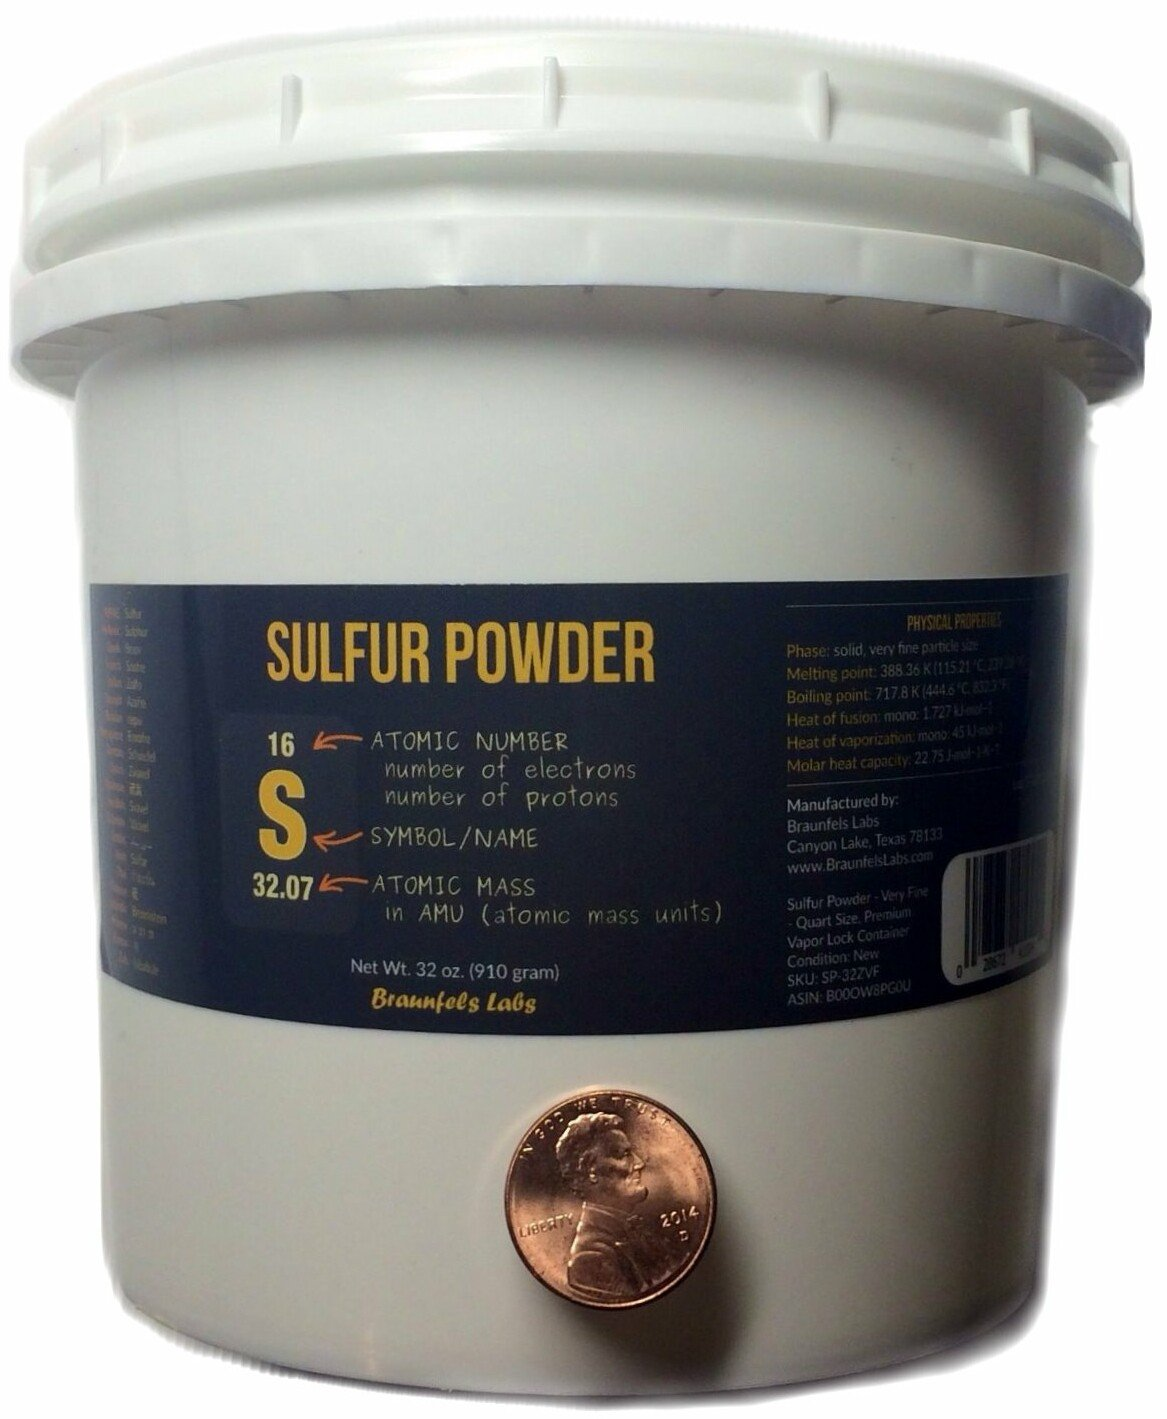 Vapor Lock QUART - Sulfur Powder - Very Fine - Premium, 32 oz - 2 Pounds Braunfels Labs